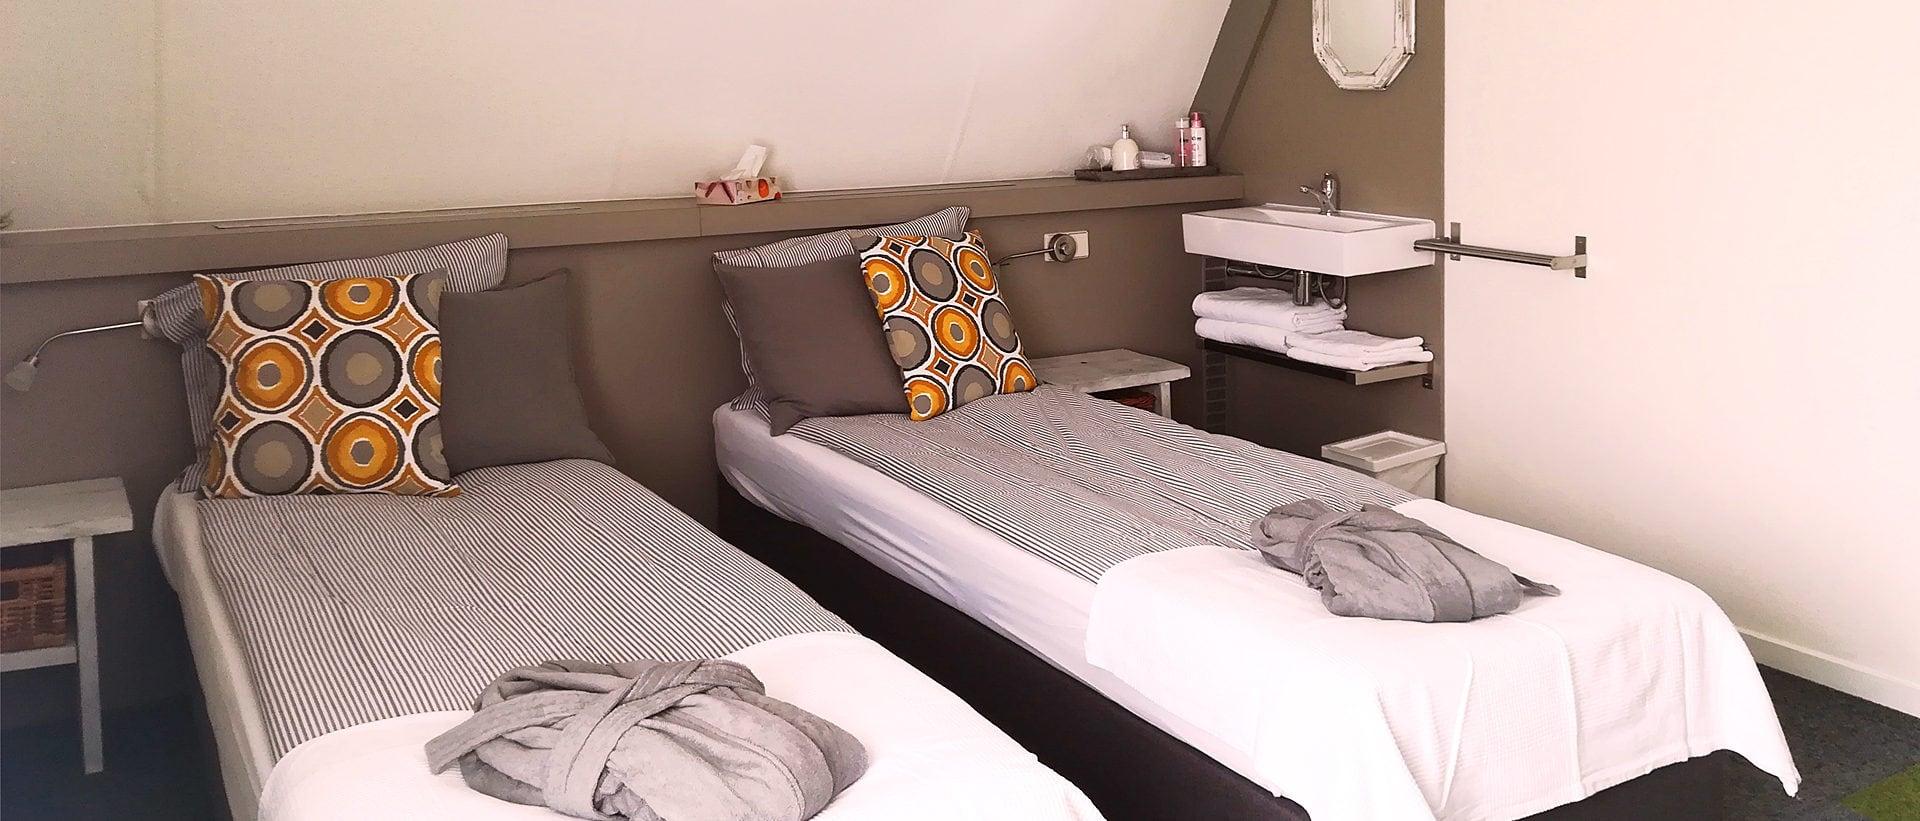 Dutch B&B in Rhenen, quiet double room with practical seating